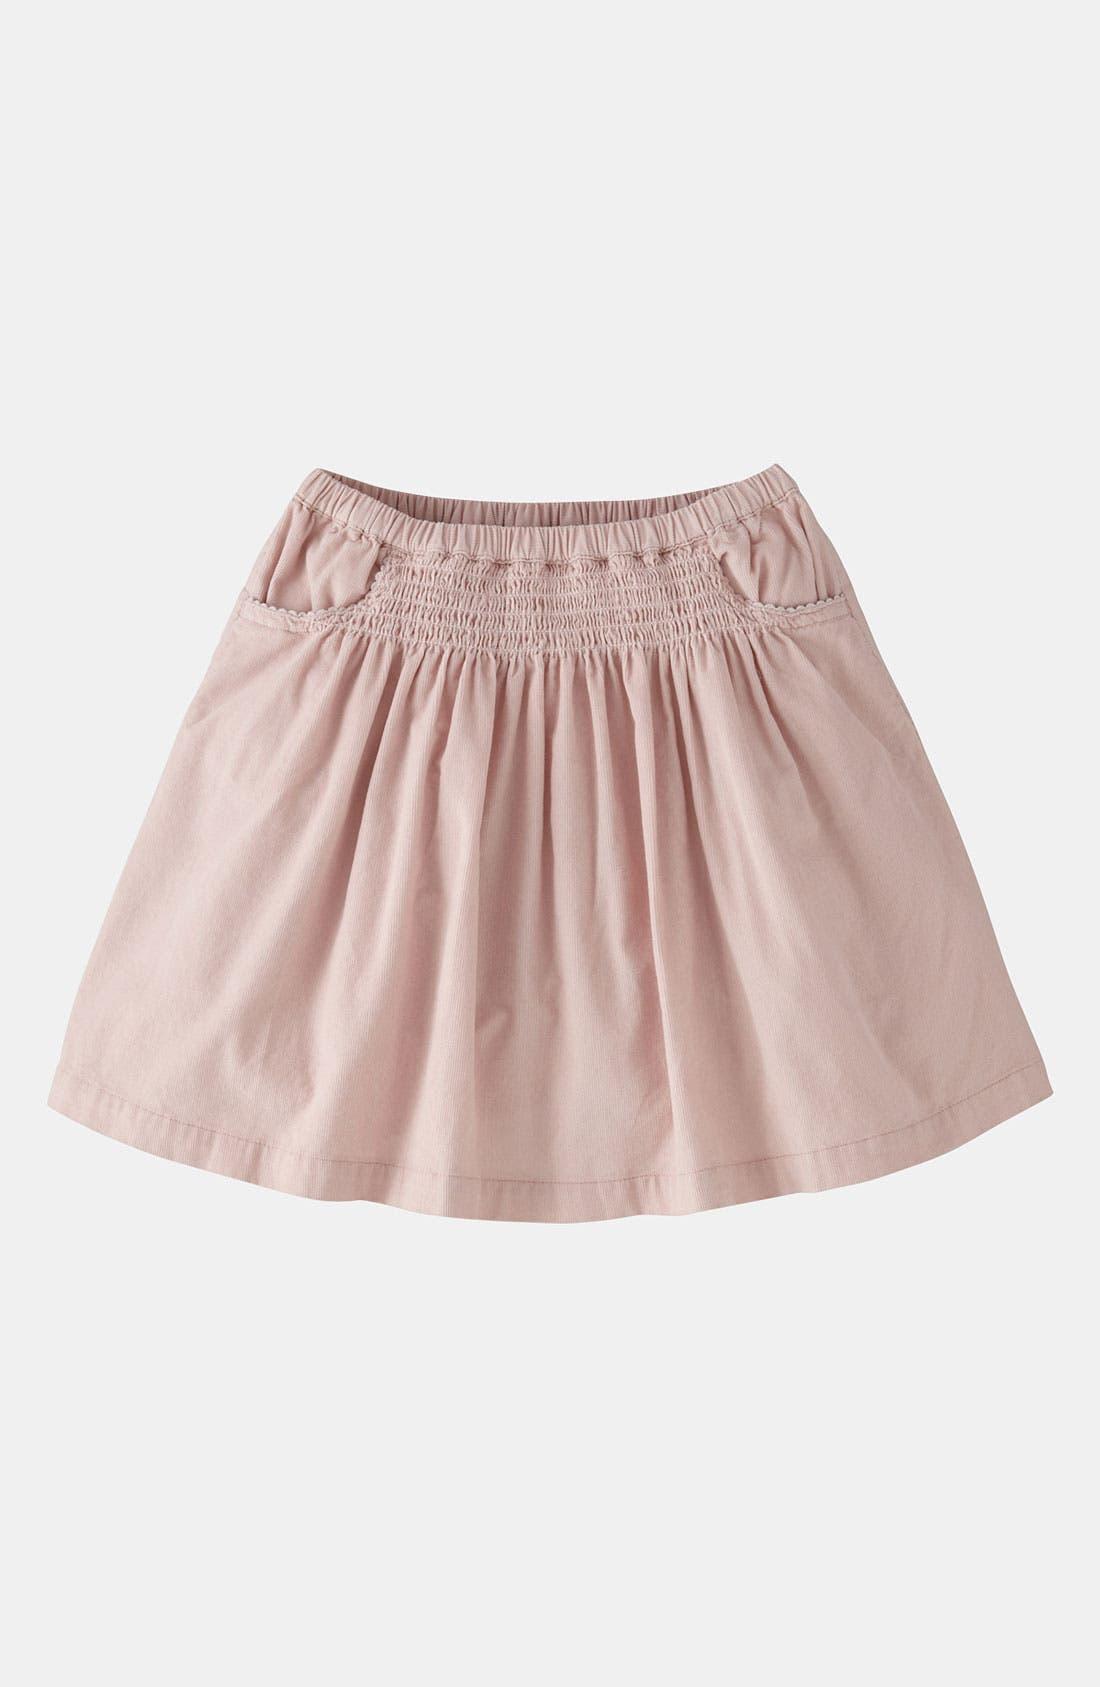 Main Image - Mini Boden 'Everyday' Corduroy Skirt (Little Girls & Big Girls)